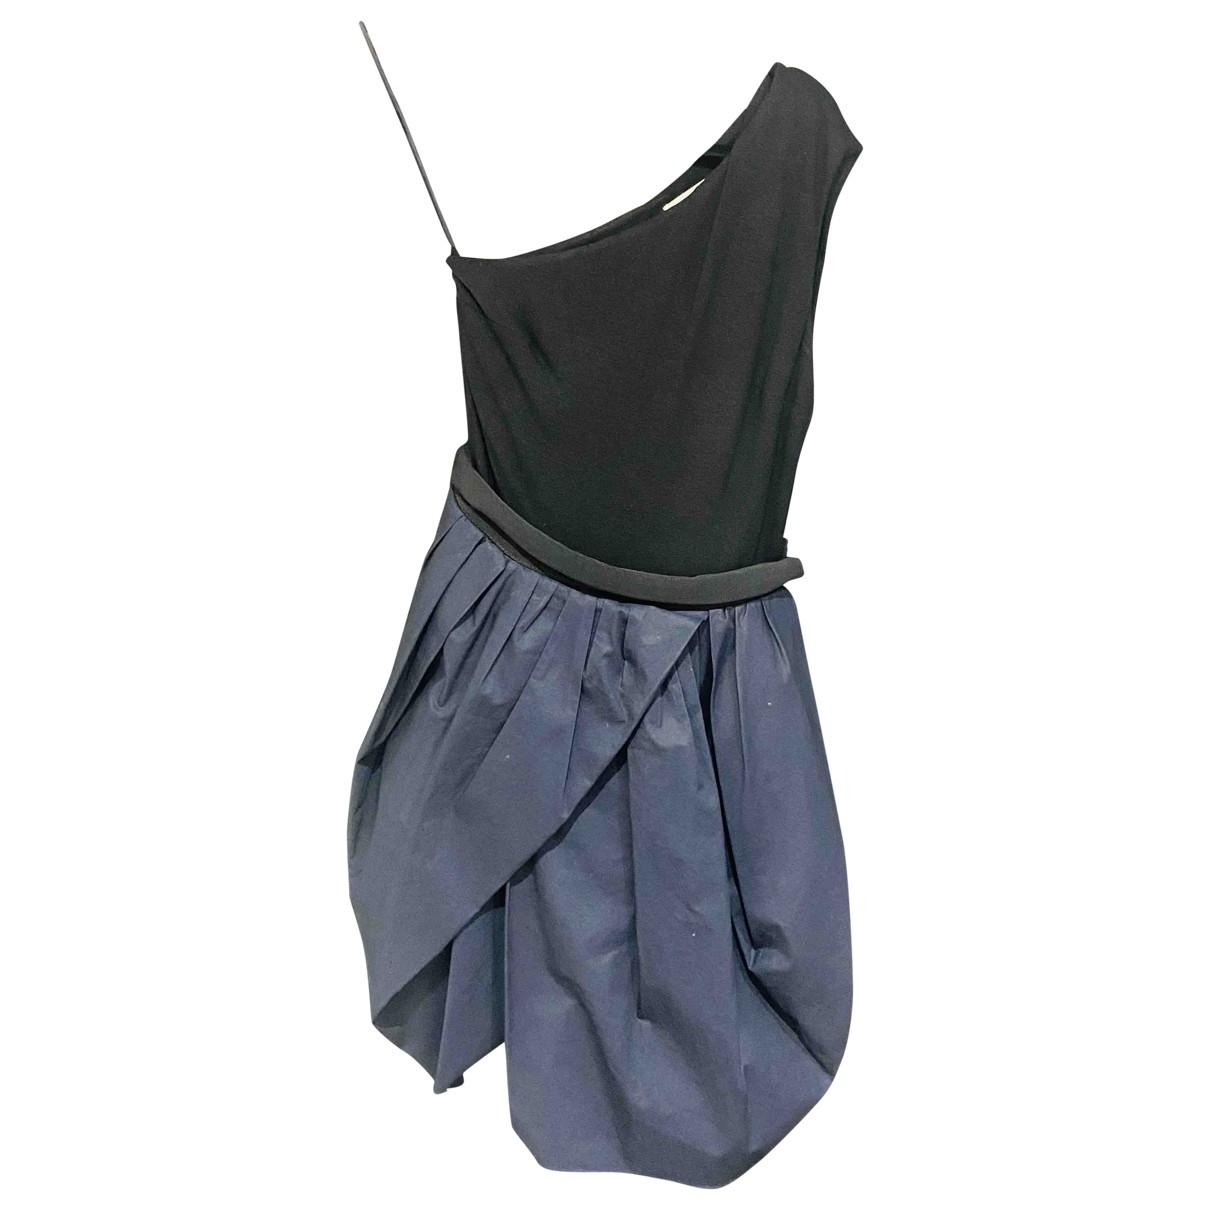 Carven \N Cotton dress for Women 36 FR